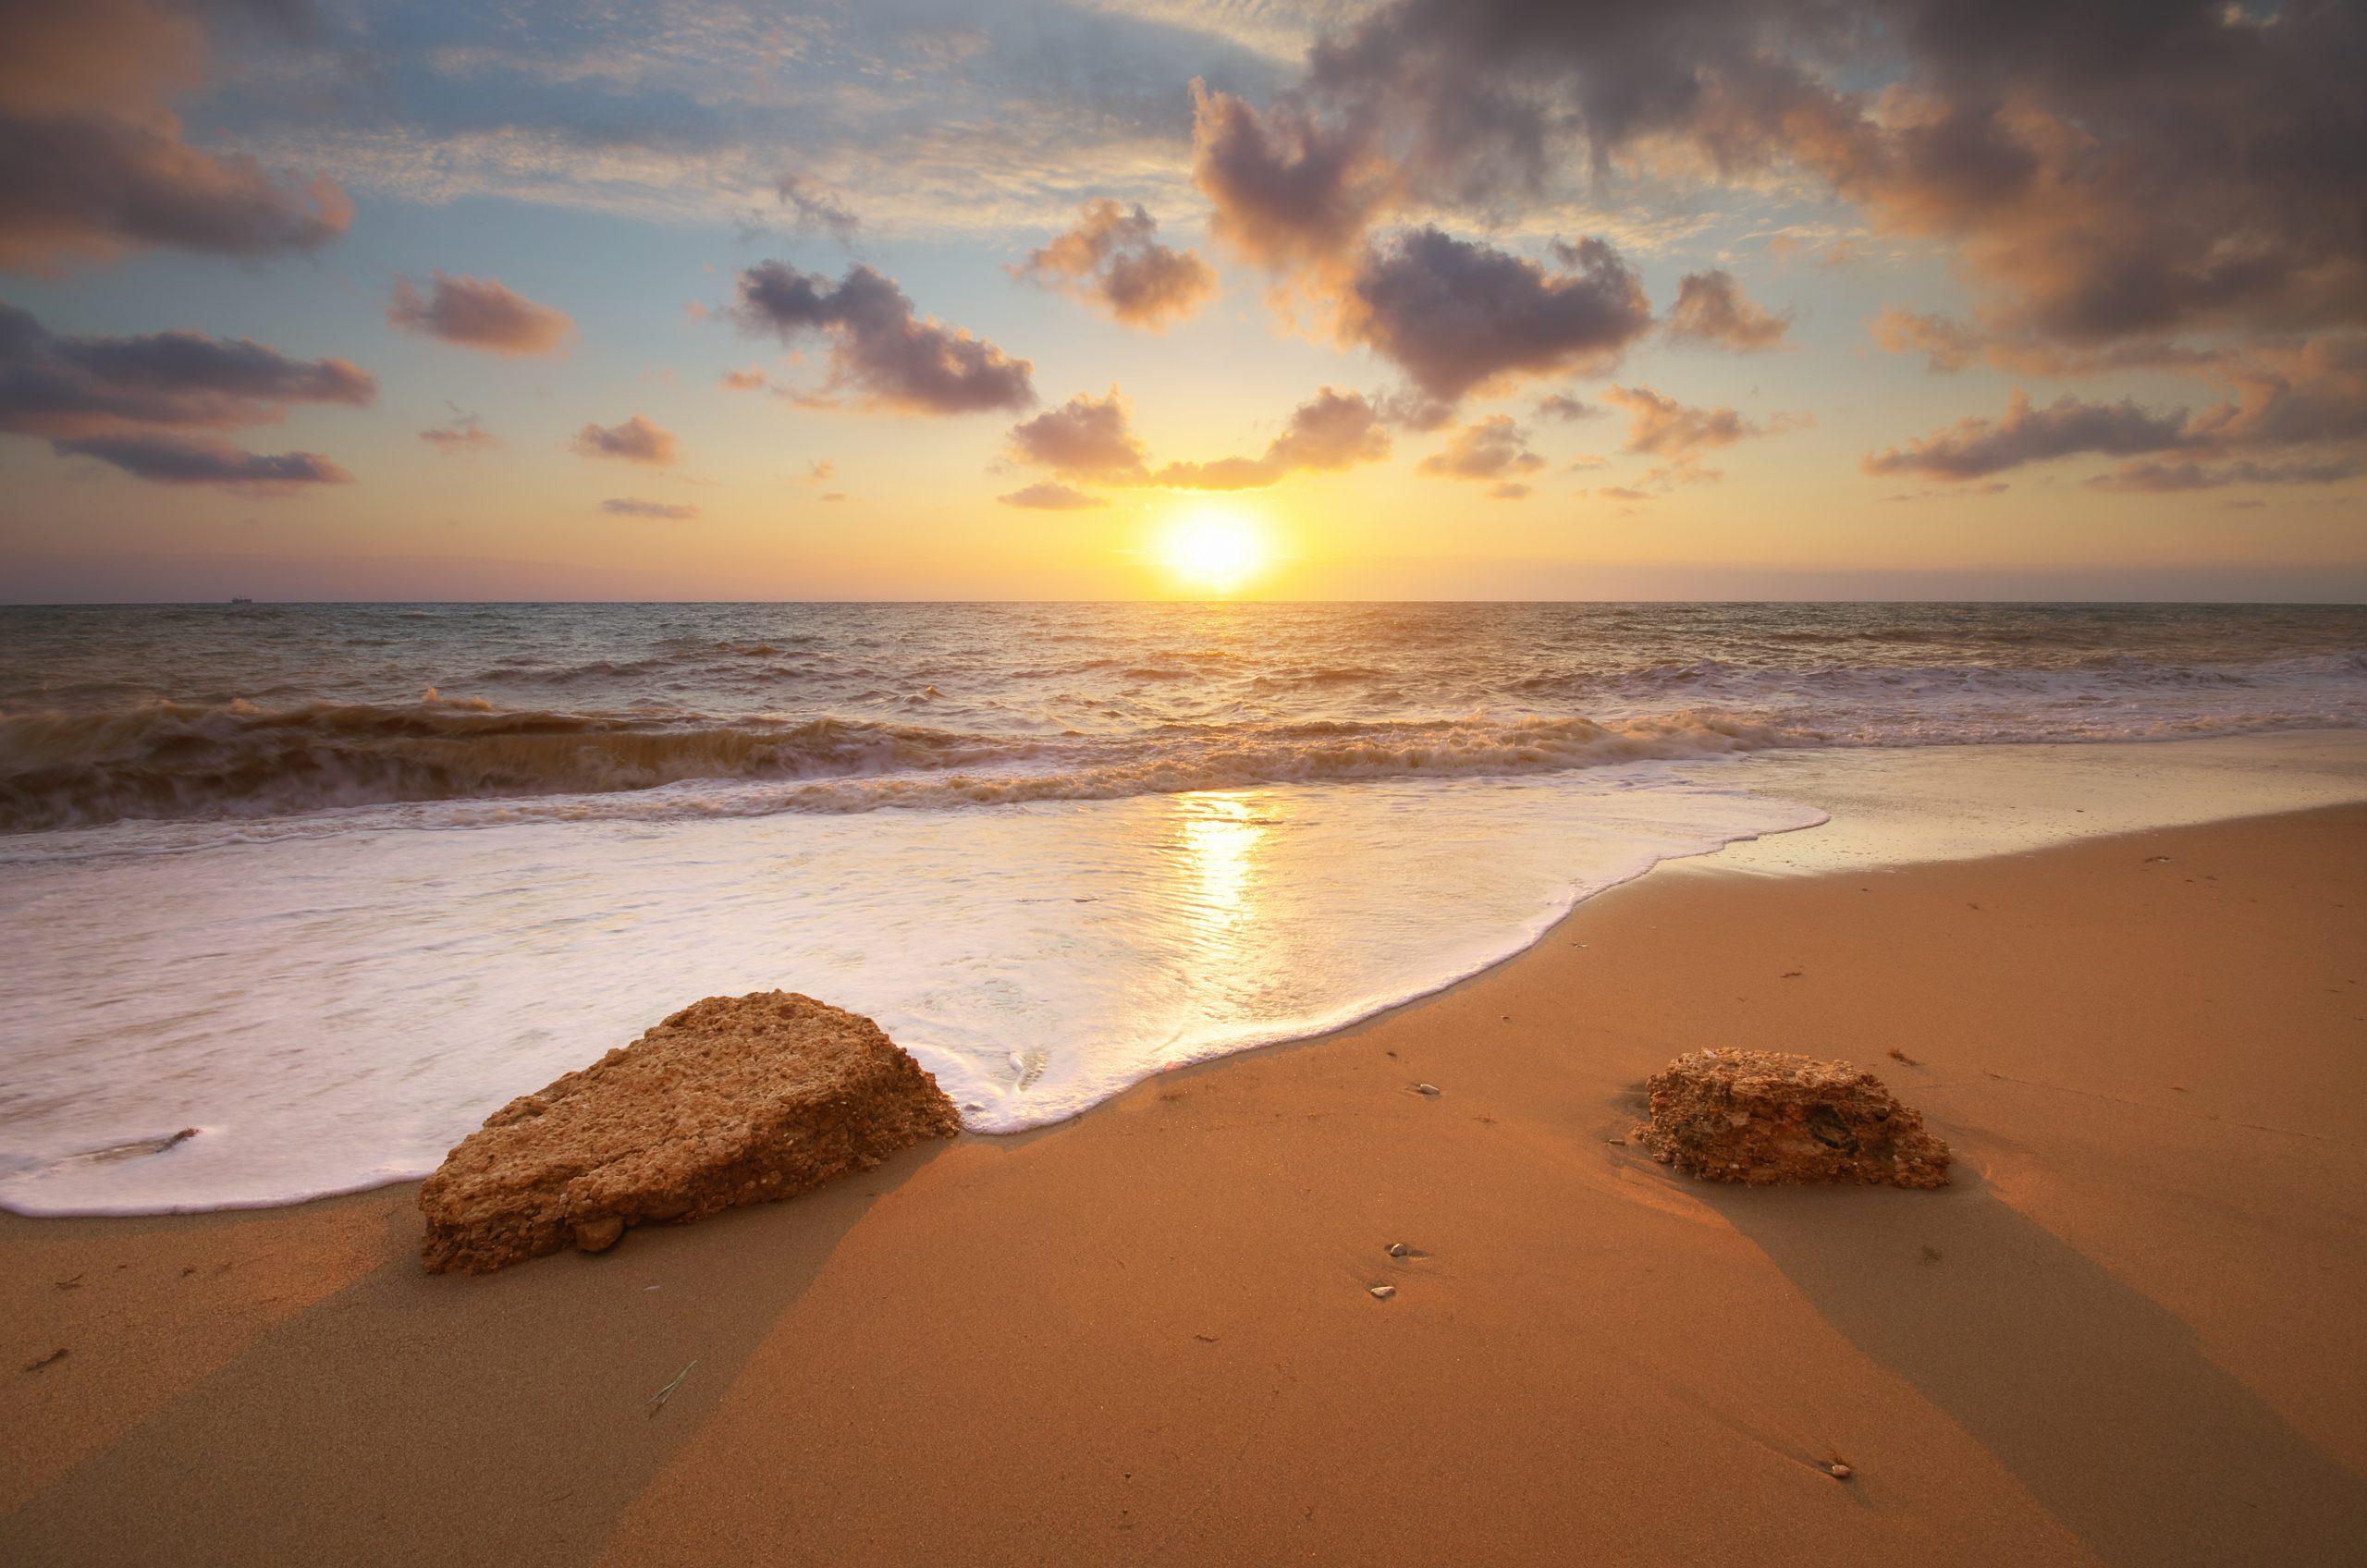 beautiful-seascape-nature-AQJY59C-scaled.jpg